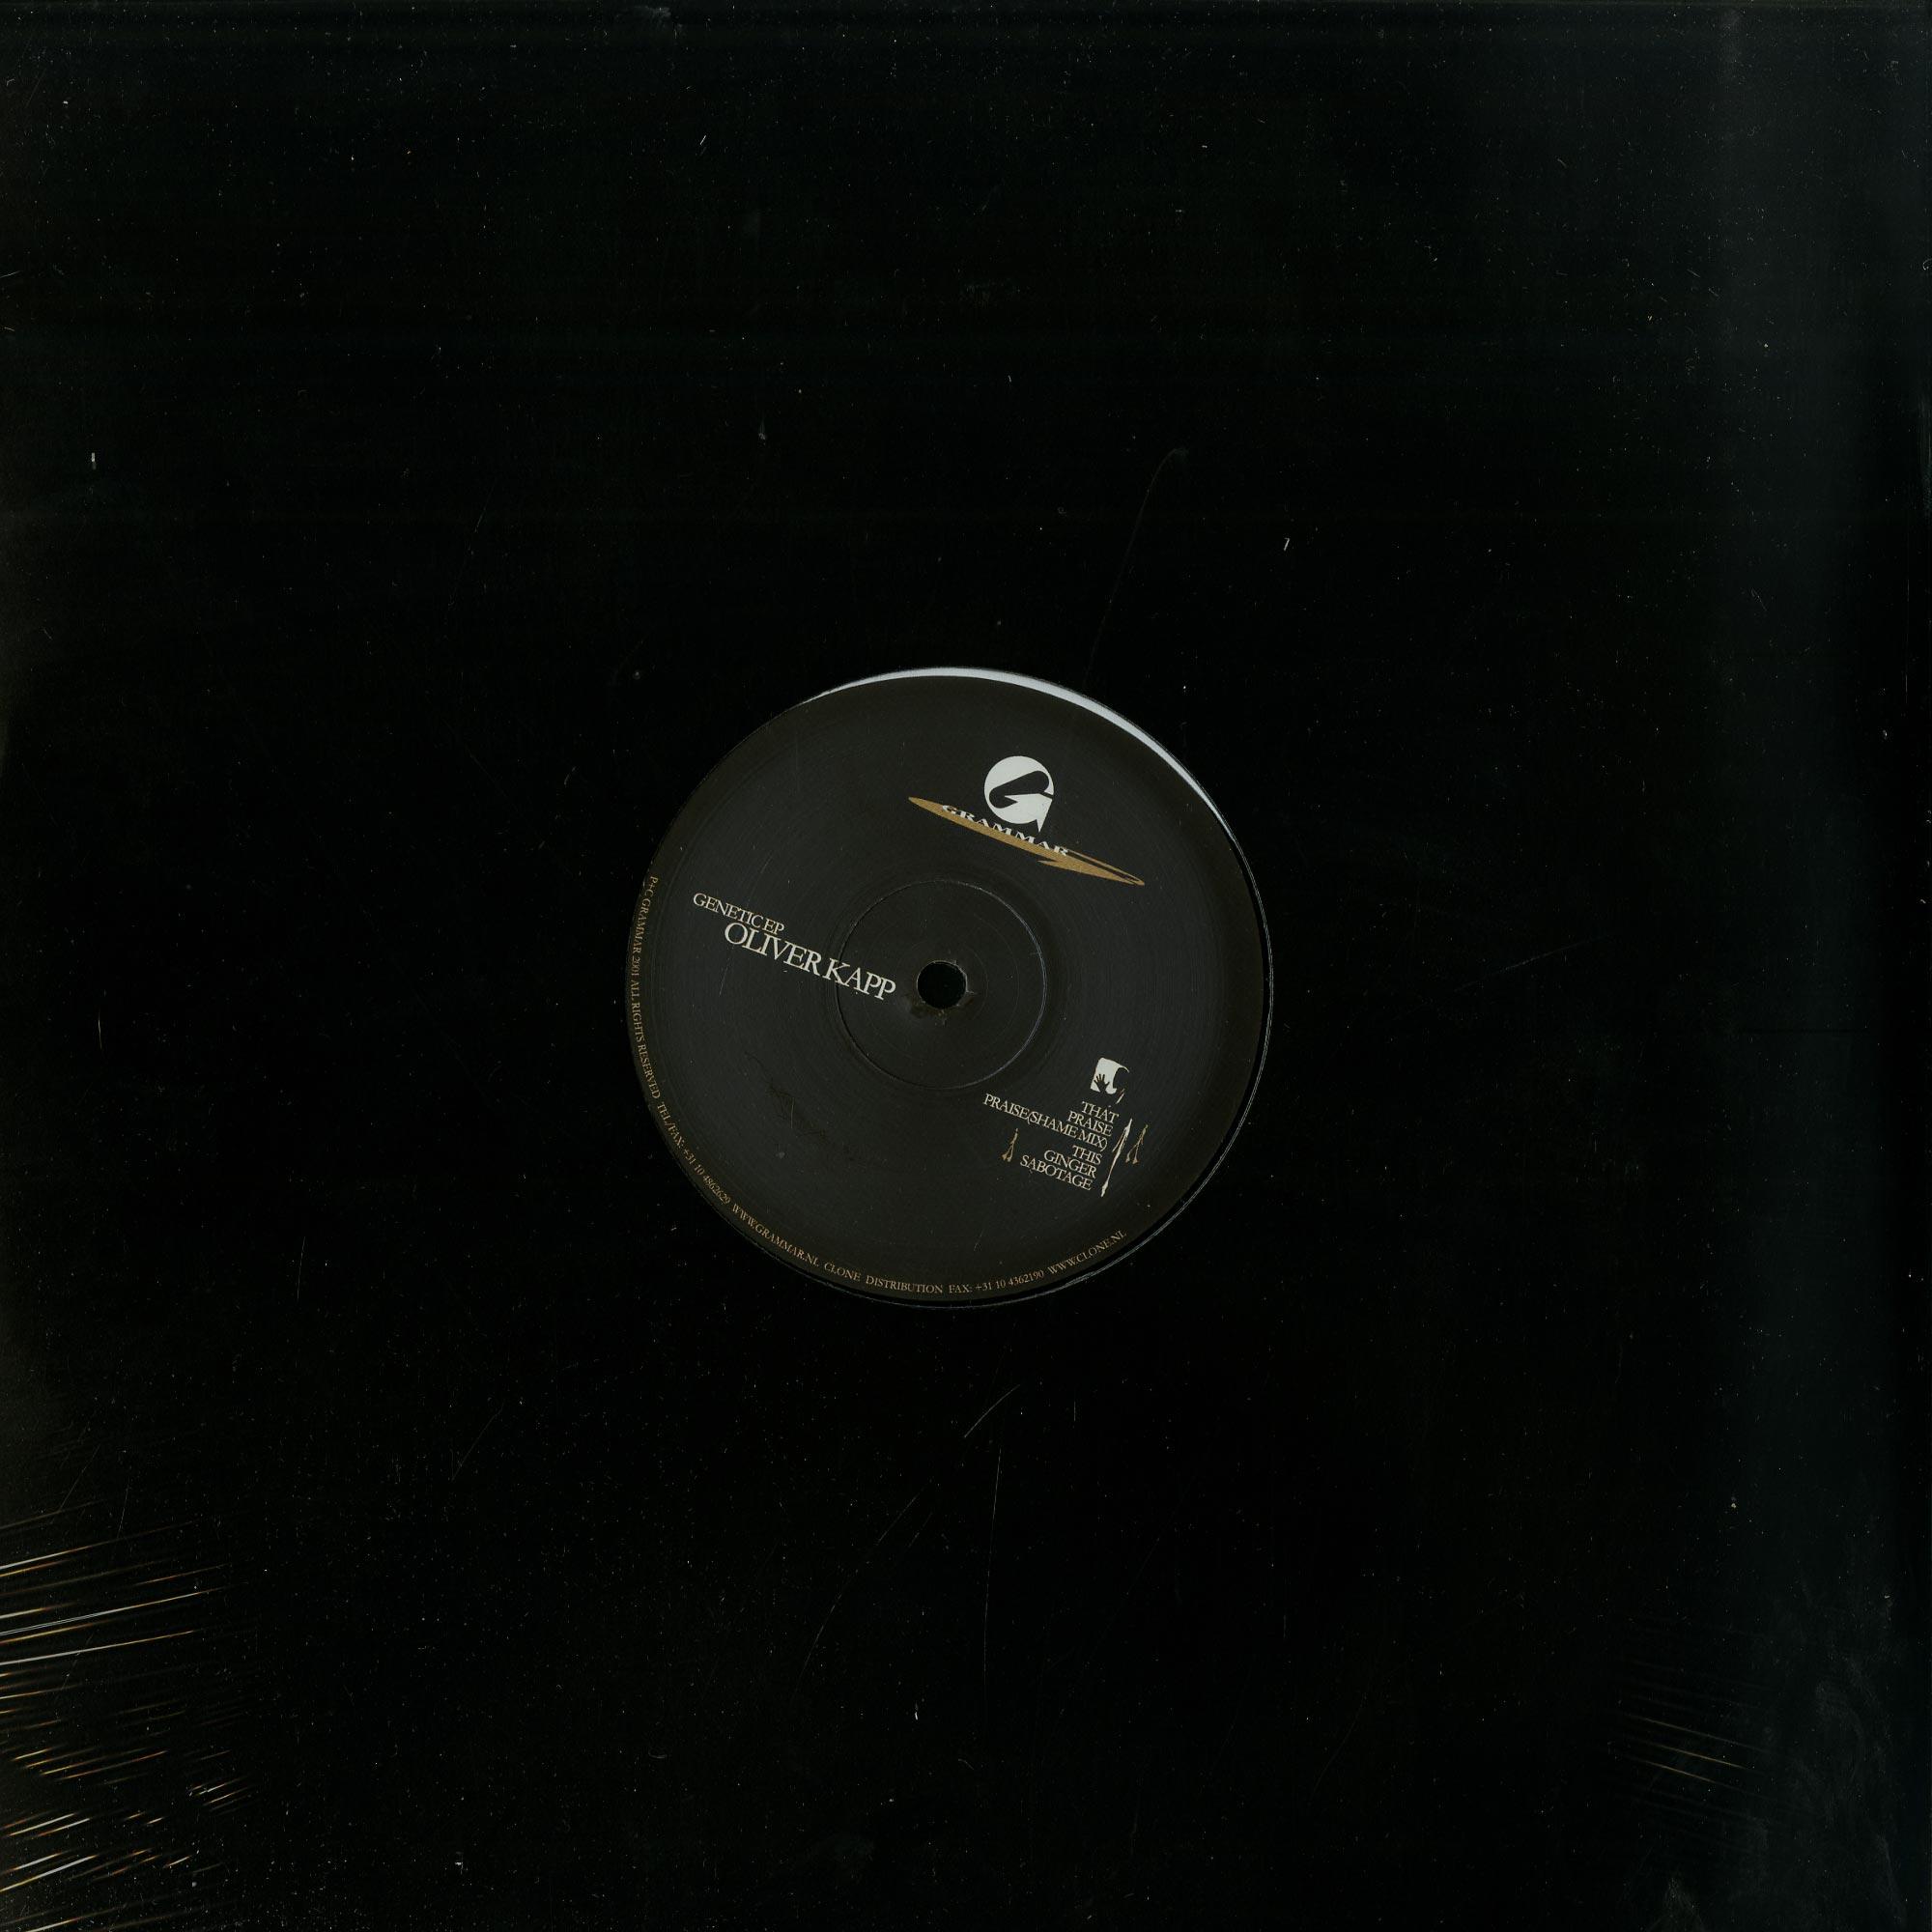 Oliver Kapp - GENETIC EP